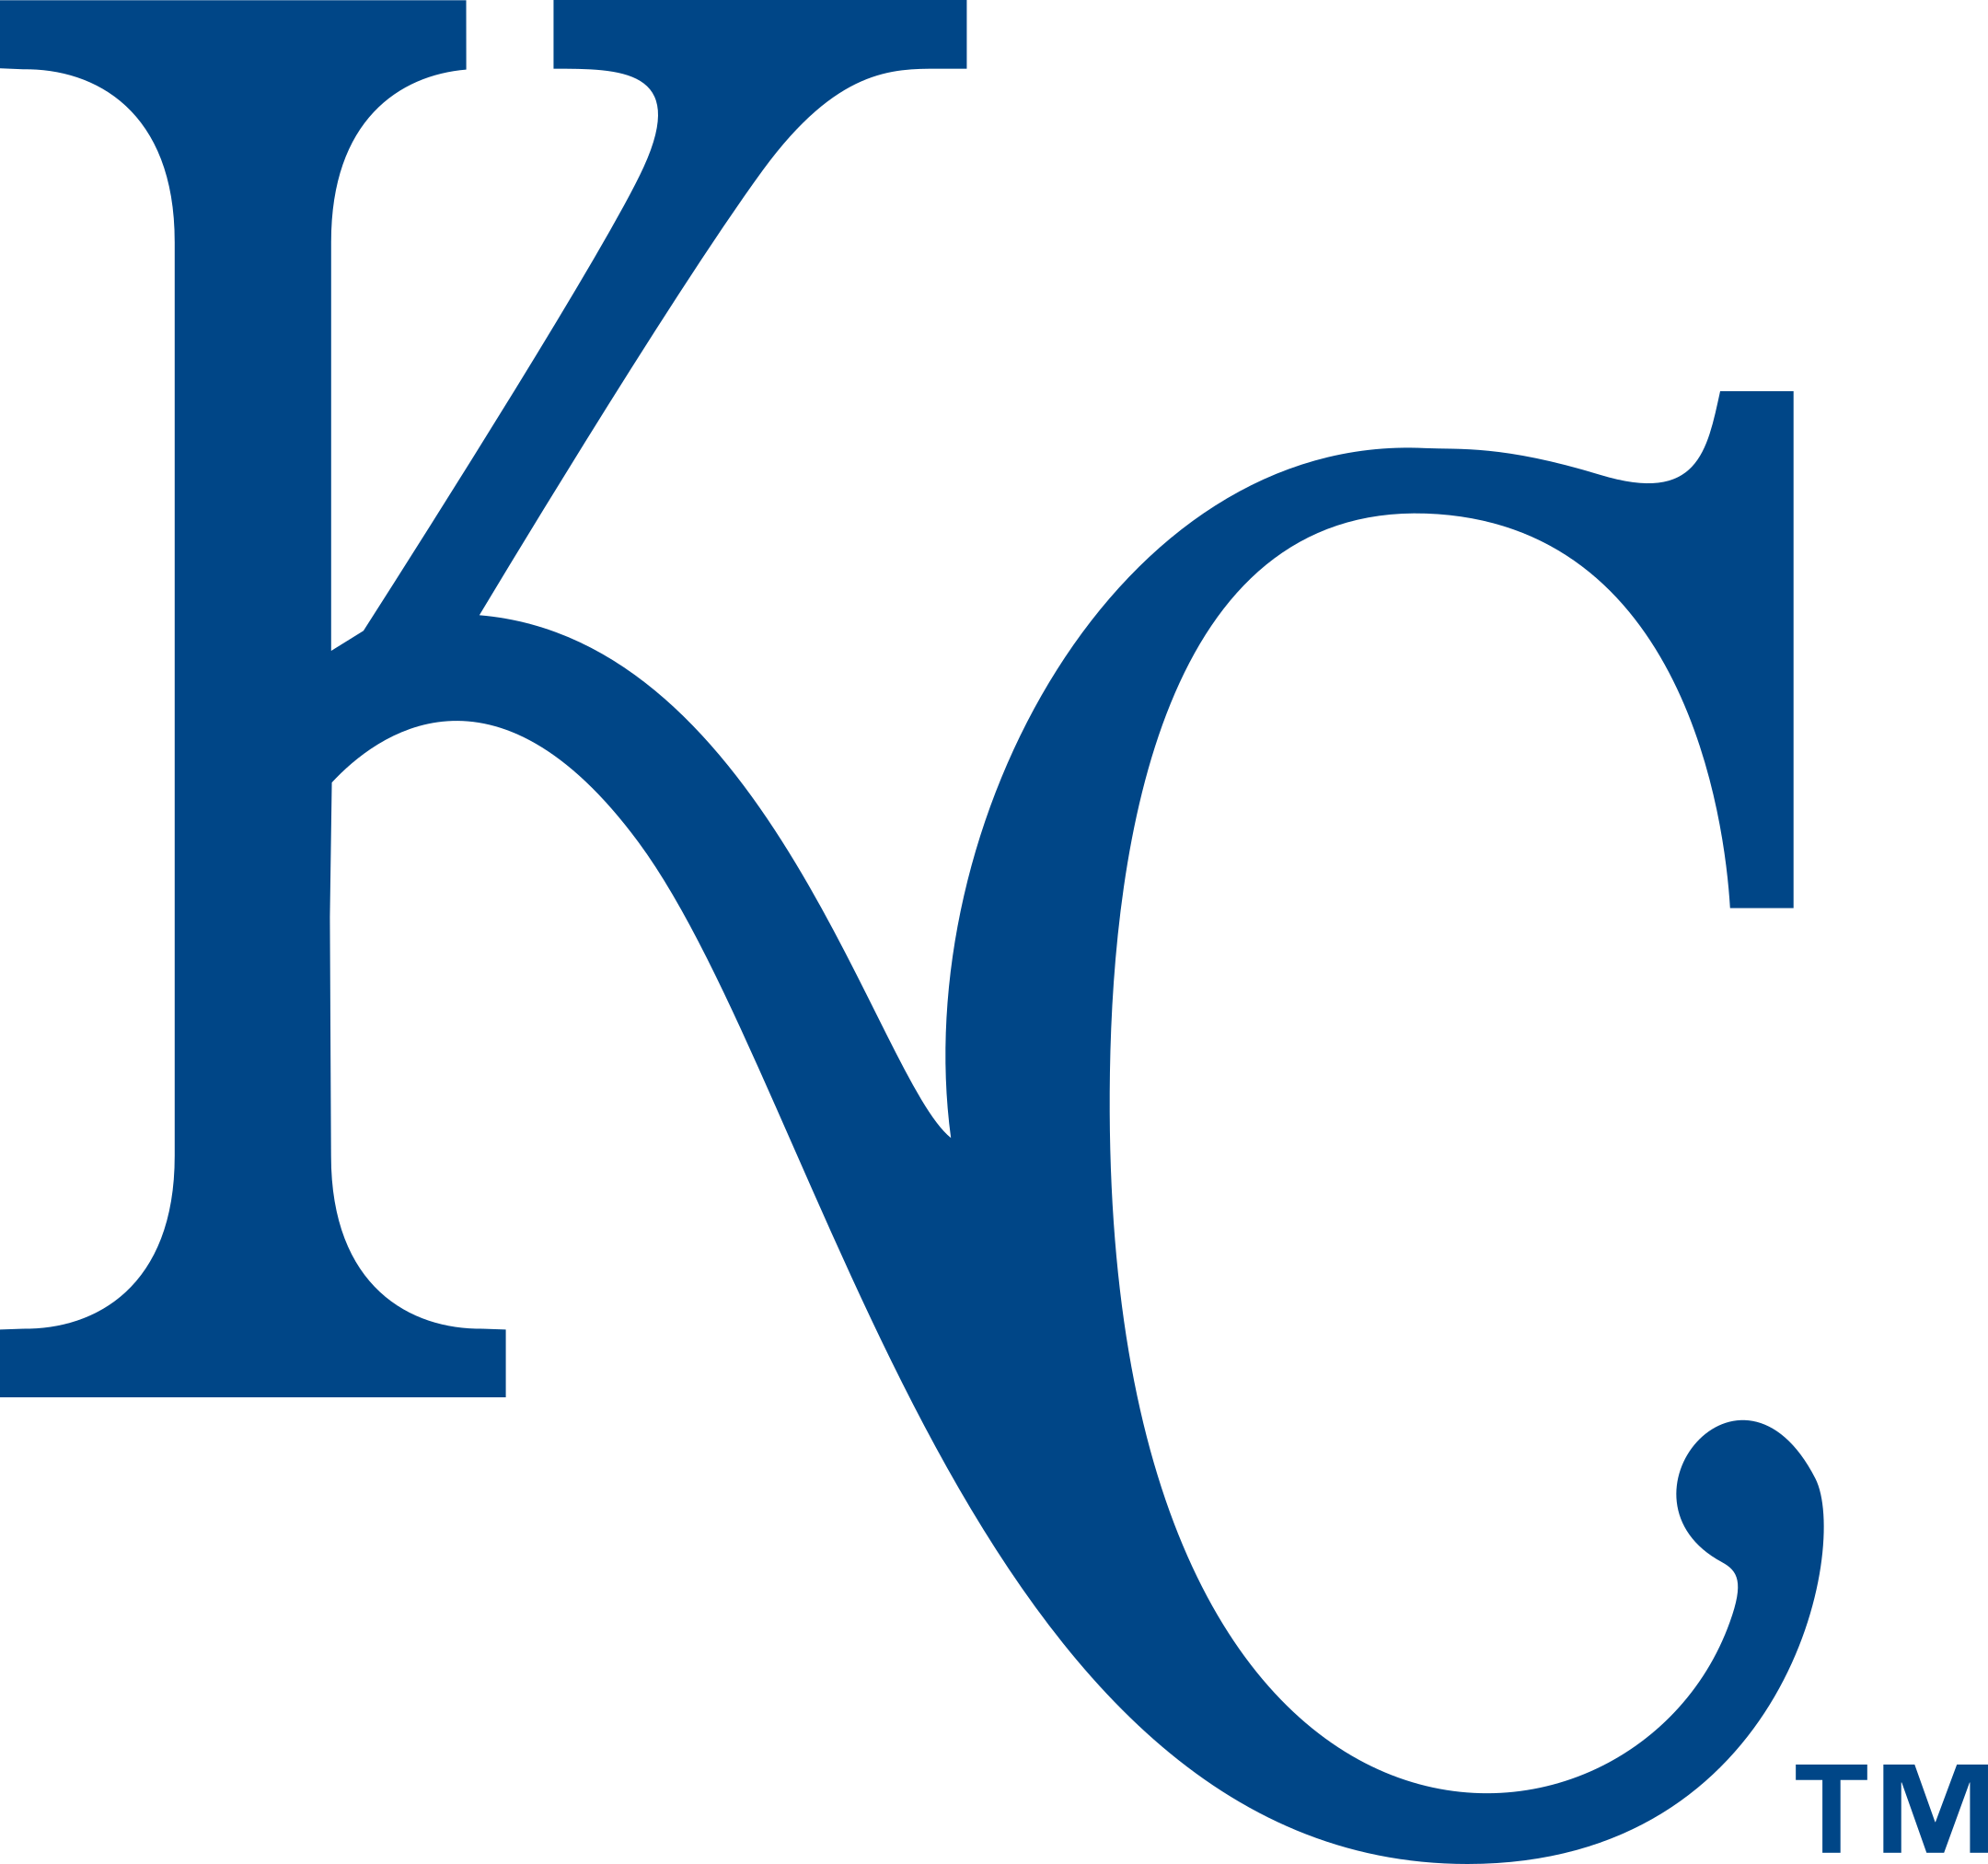 kansas city royals logo 1 - Kansas City Royals Logo